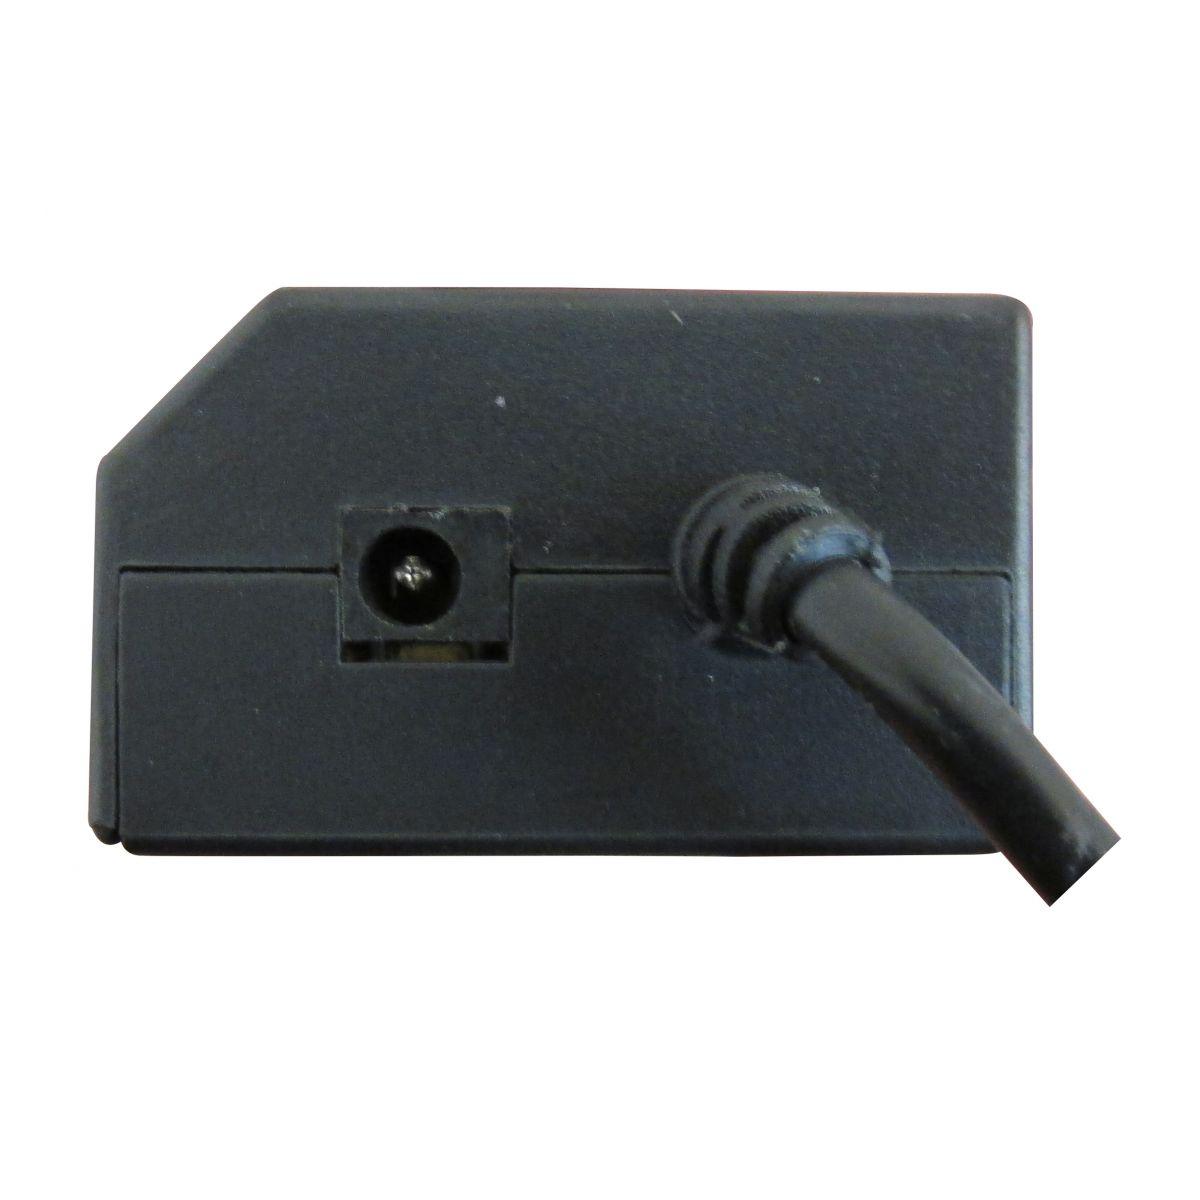 Hub Usb 4 Portas Extensor Hi-speed 480 Mbps Usb 2.0 - Preto